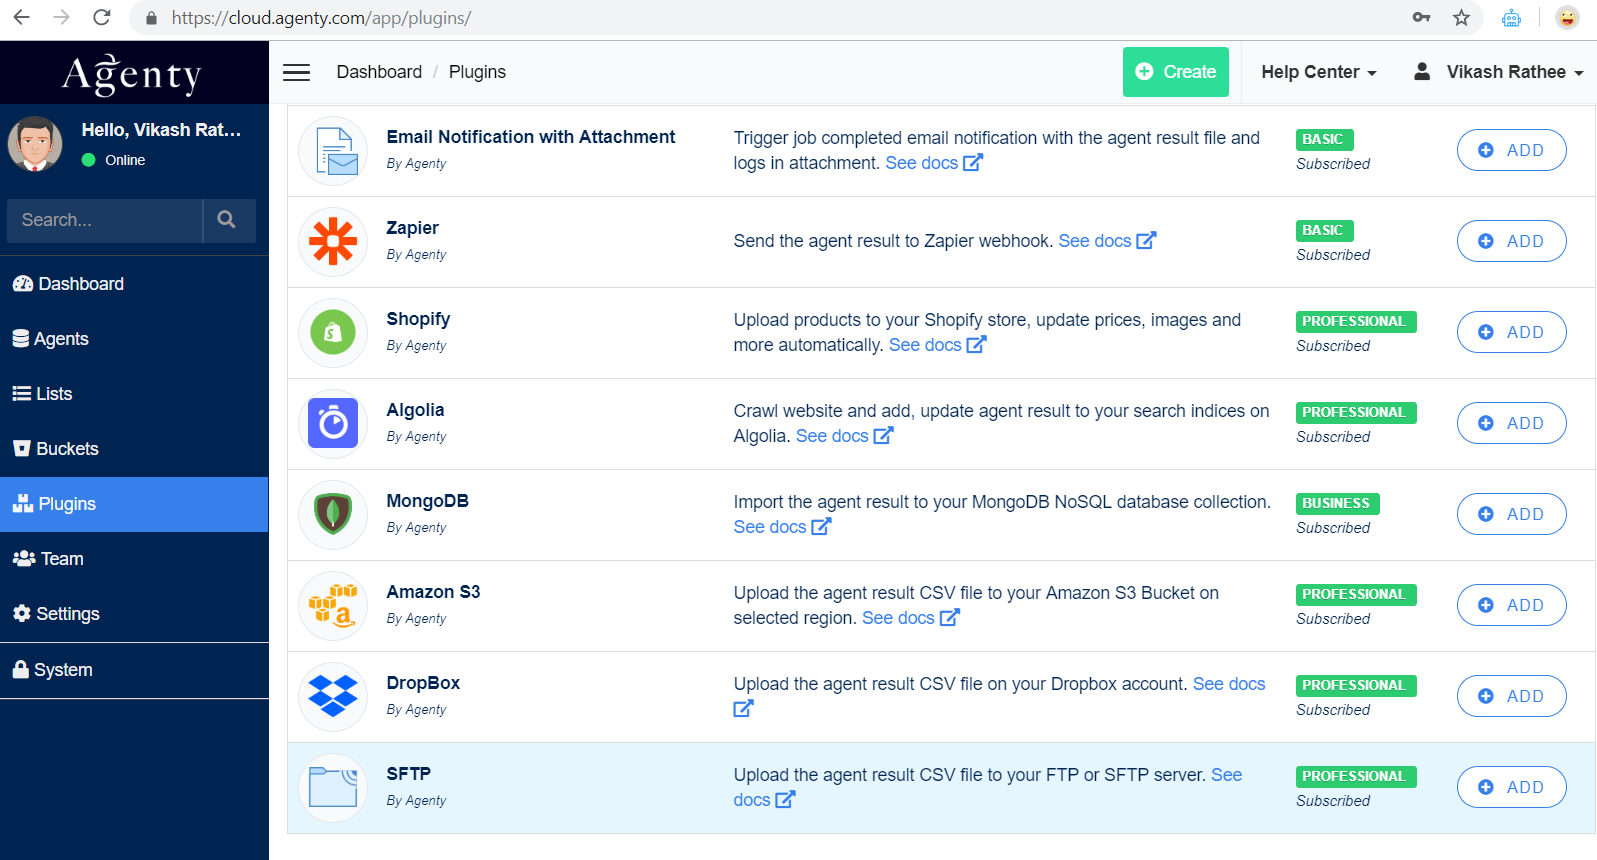 SFTP plugin